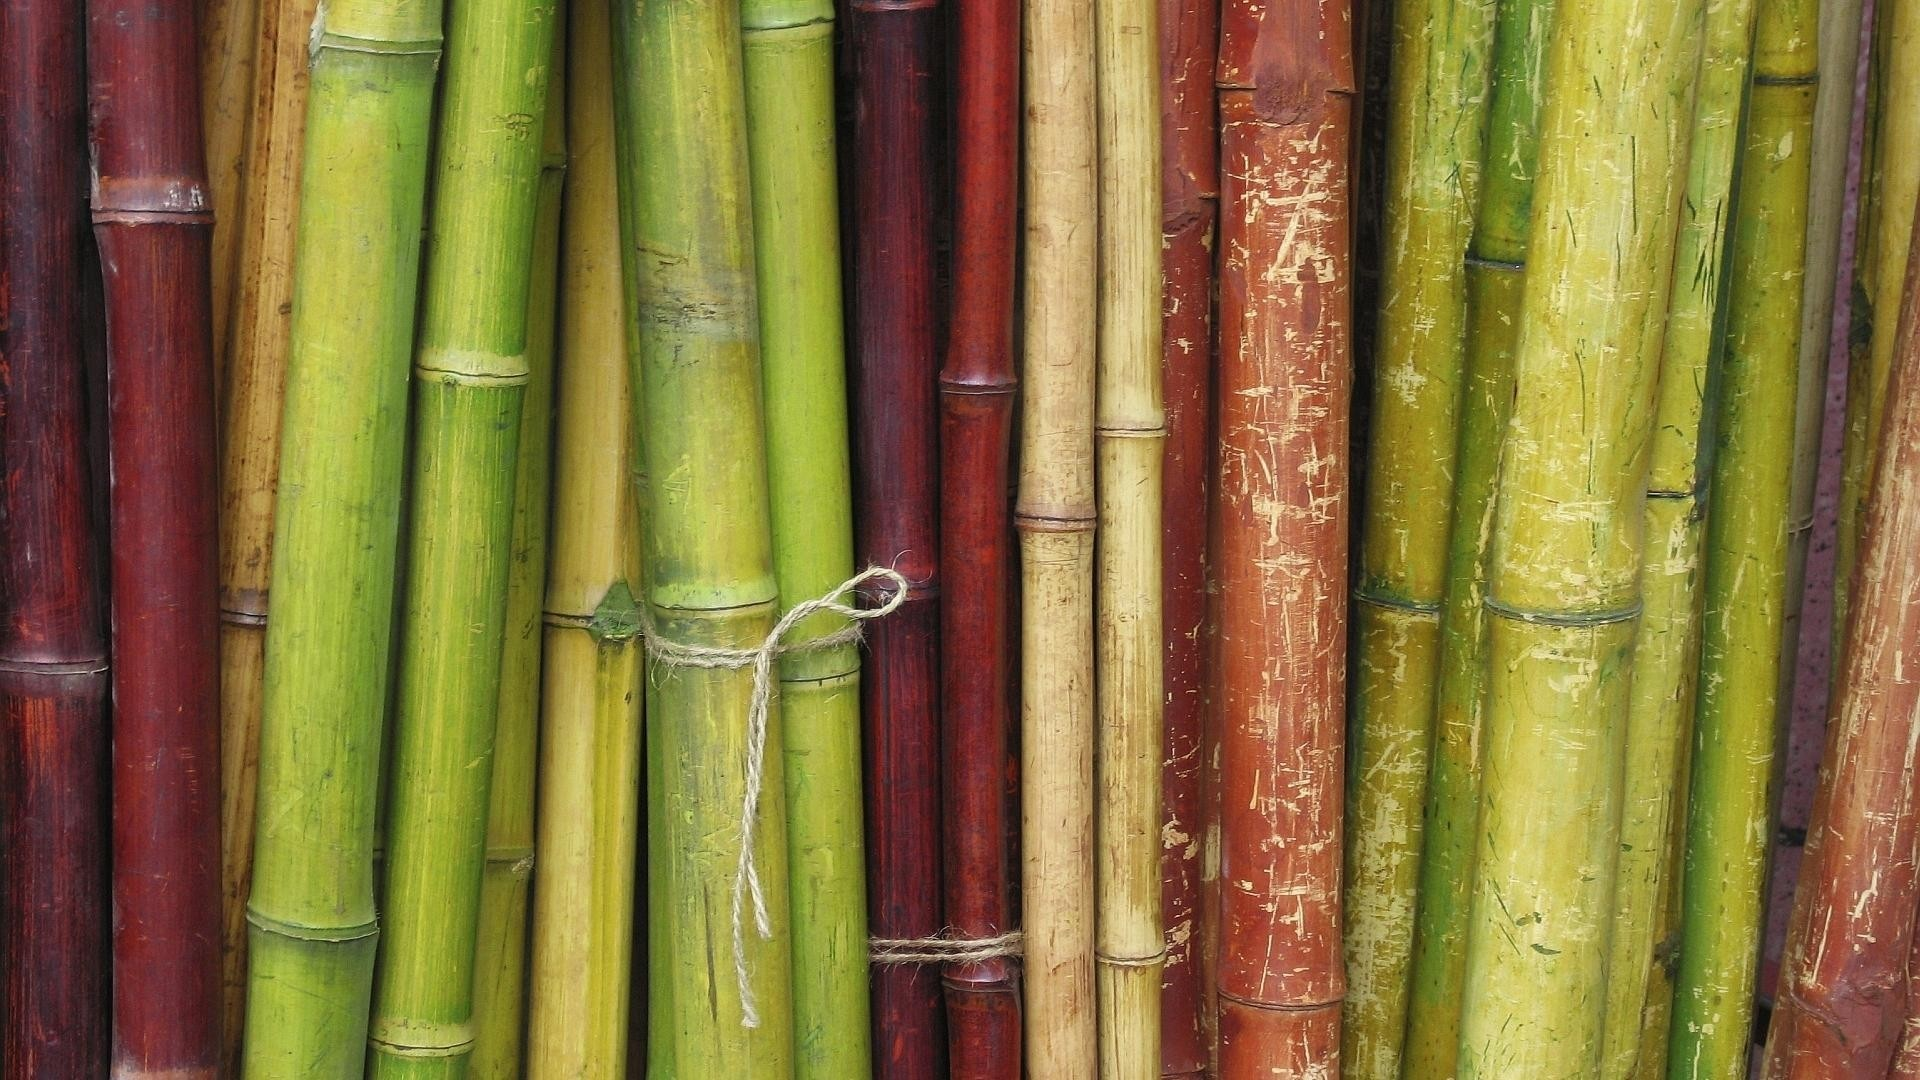 Bamboo Wallpaper theme